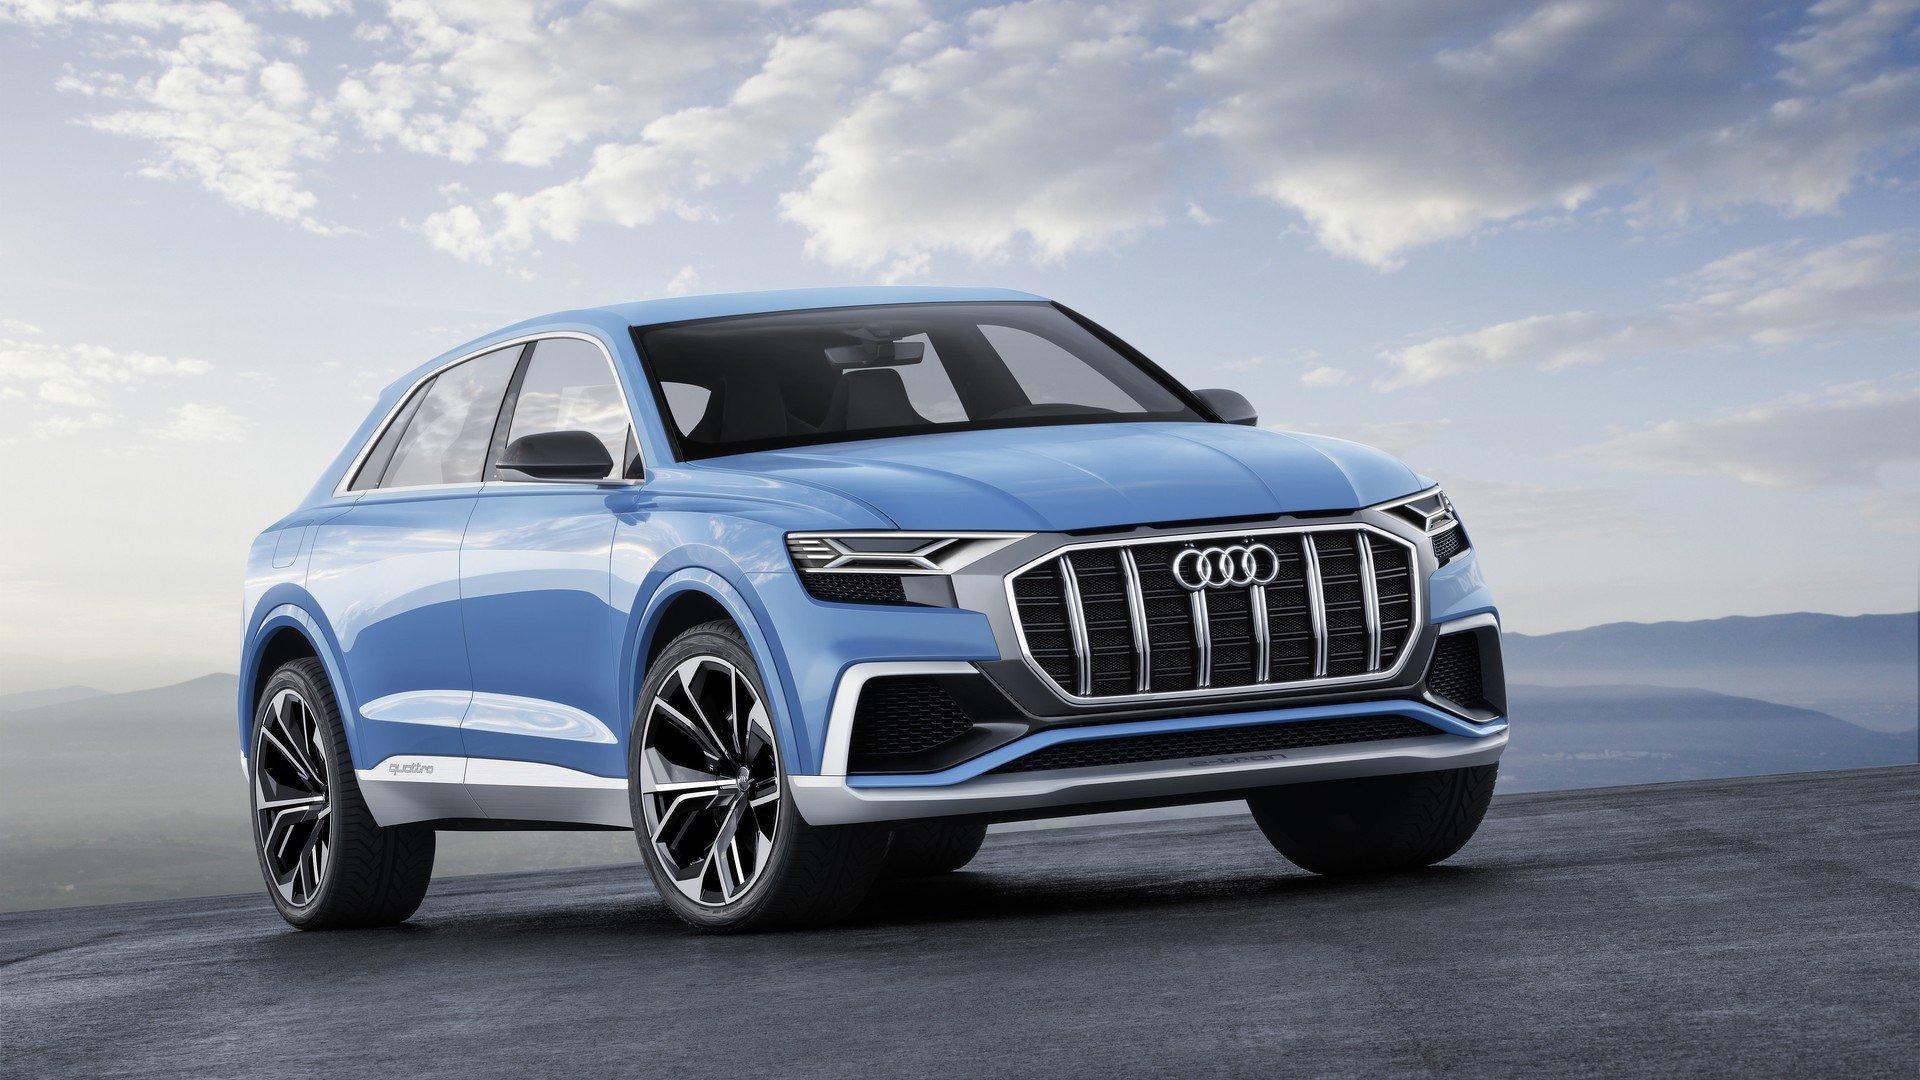 Kekurangan Audi Q4 2018 Harga